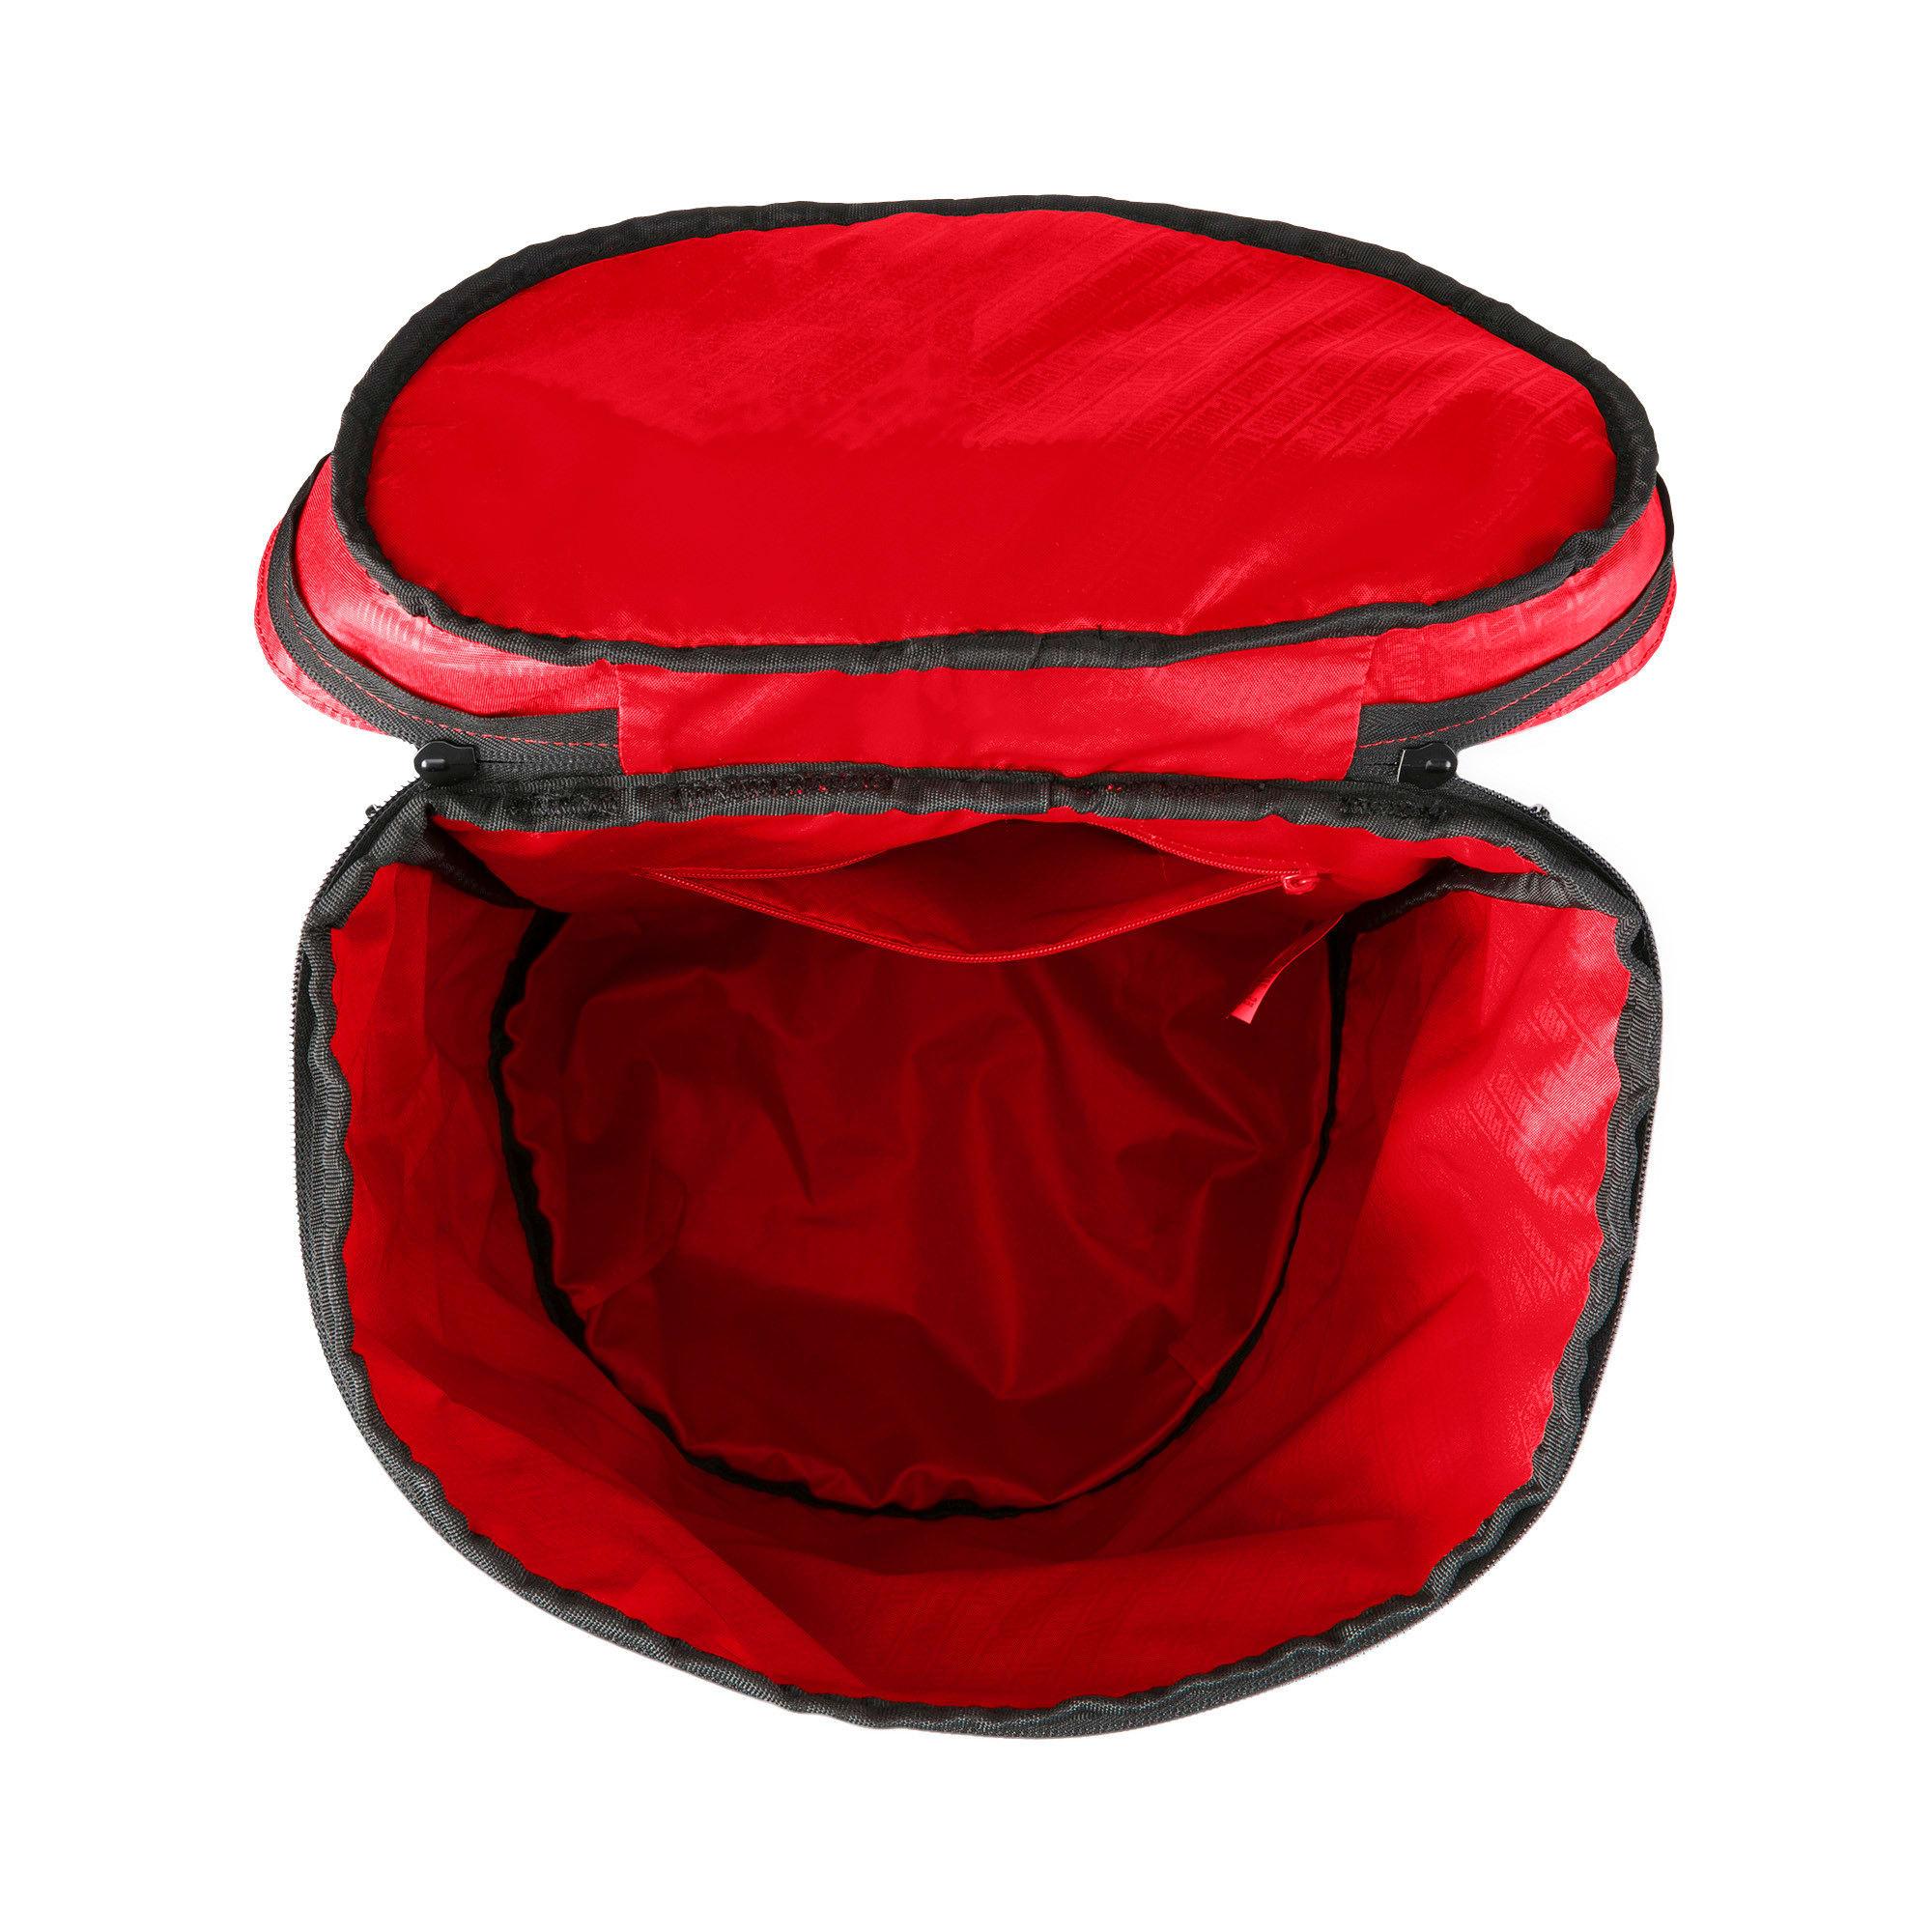 Thumbnail 5 of Ferrari Fanwear RCT Backpack, Rosso Corsa, medium